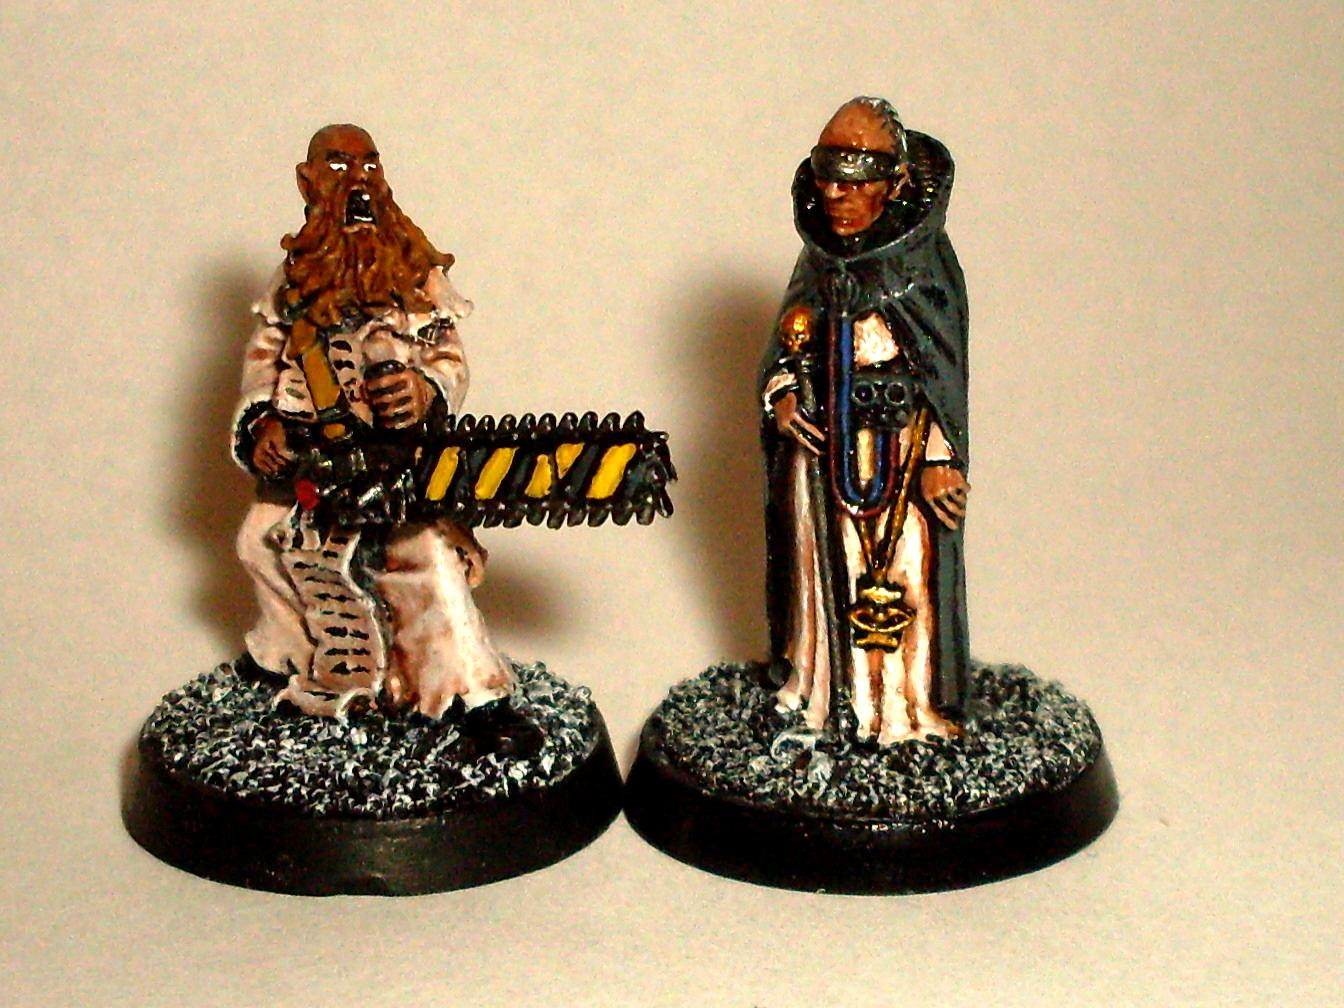 Astropath, Command, Eviscerator, Guard, Henchmen, Imperial, Inquisition, Ministorum, Priest